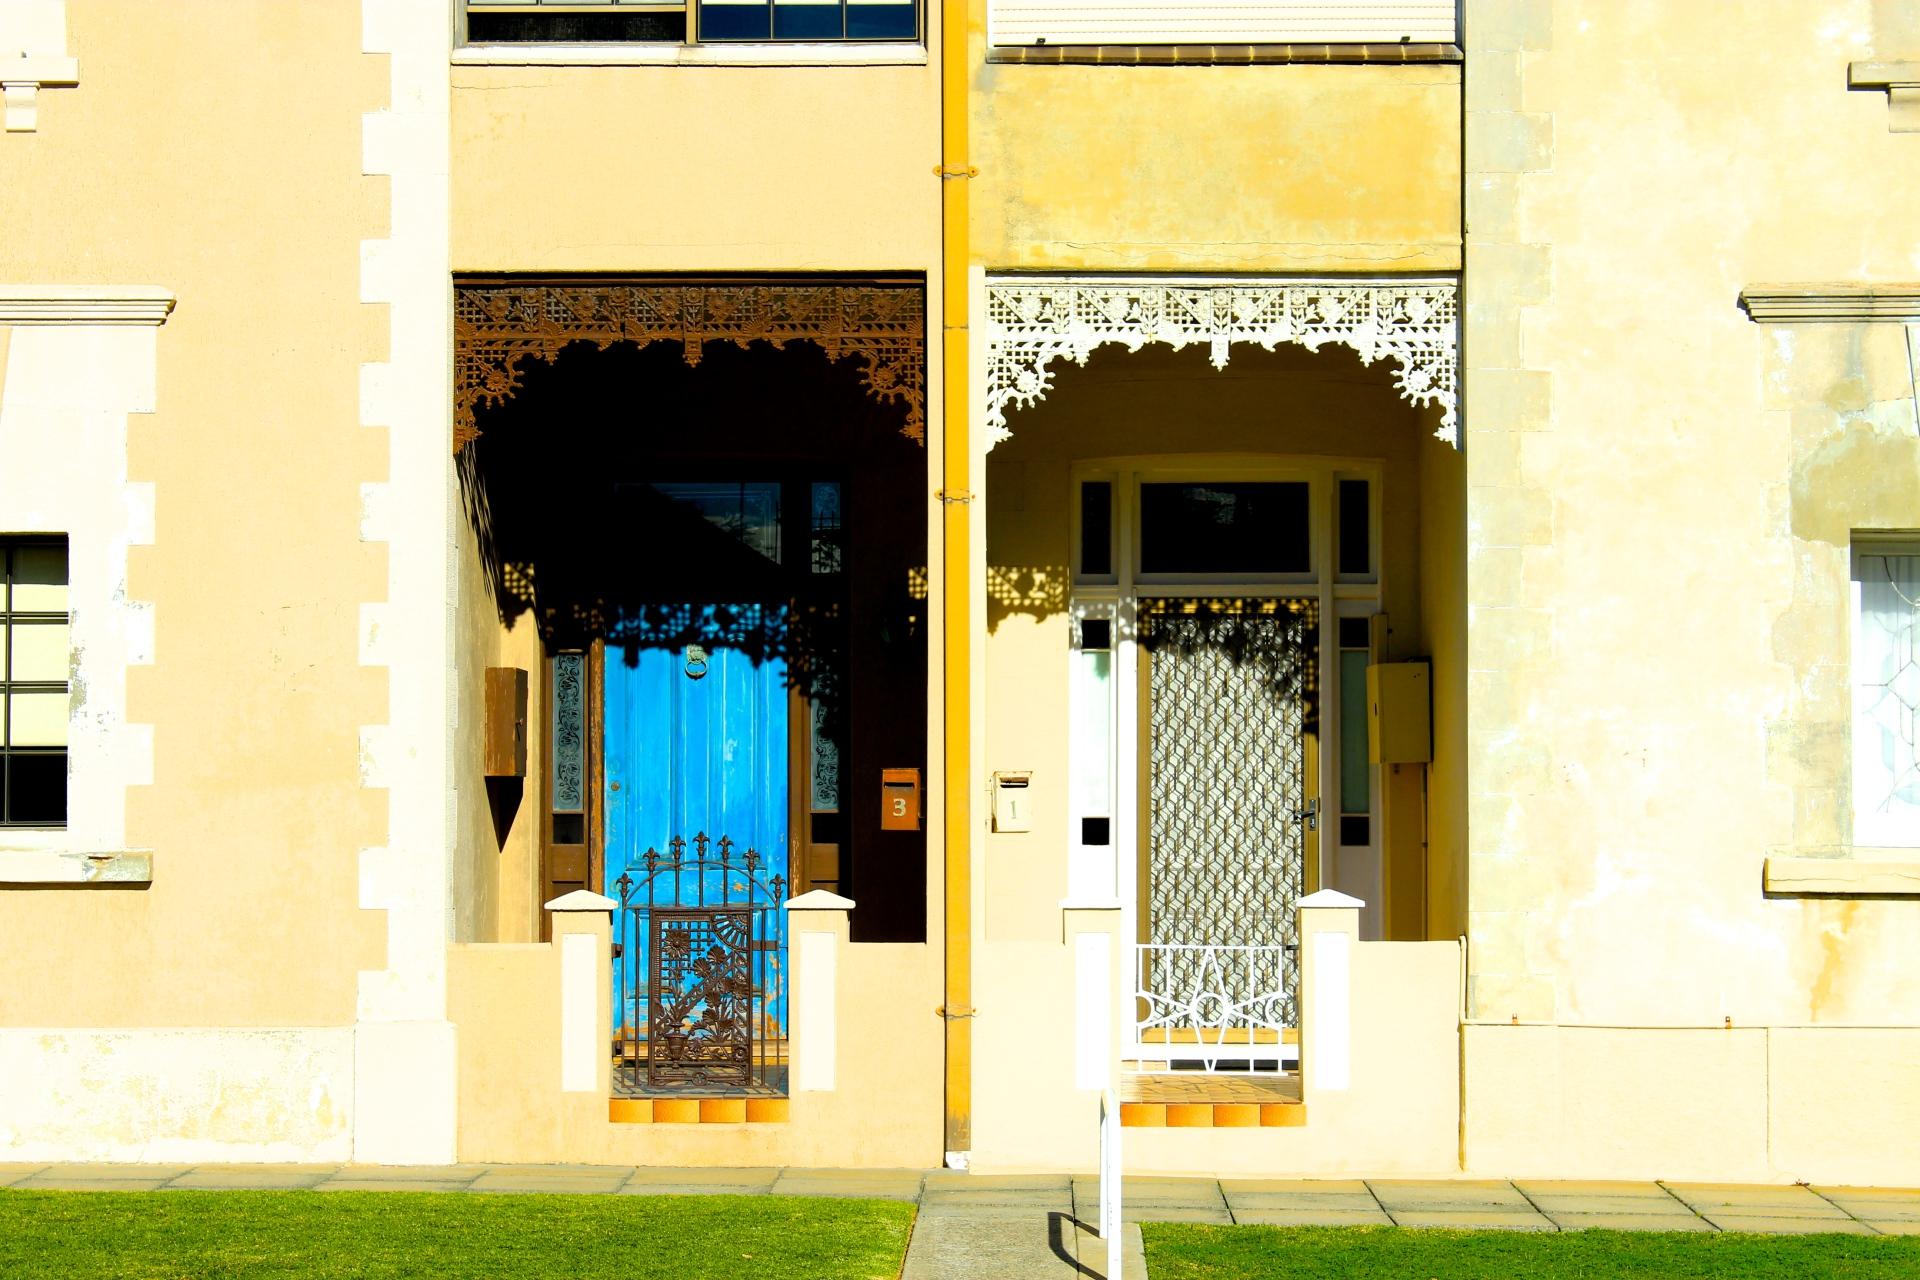 Polar Doors